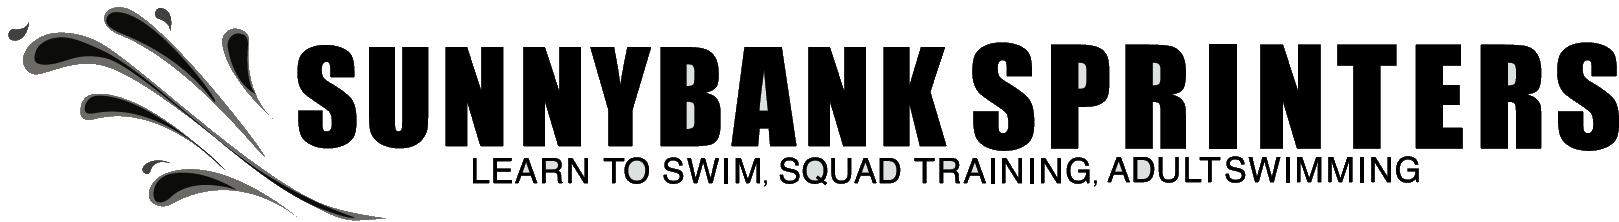 Sunnybank Sprinters